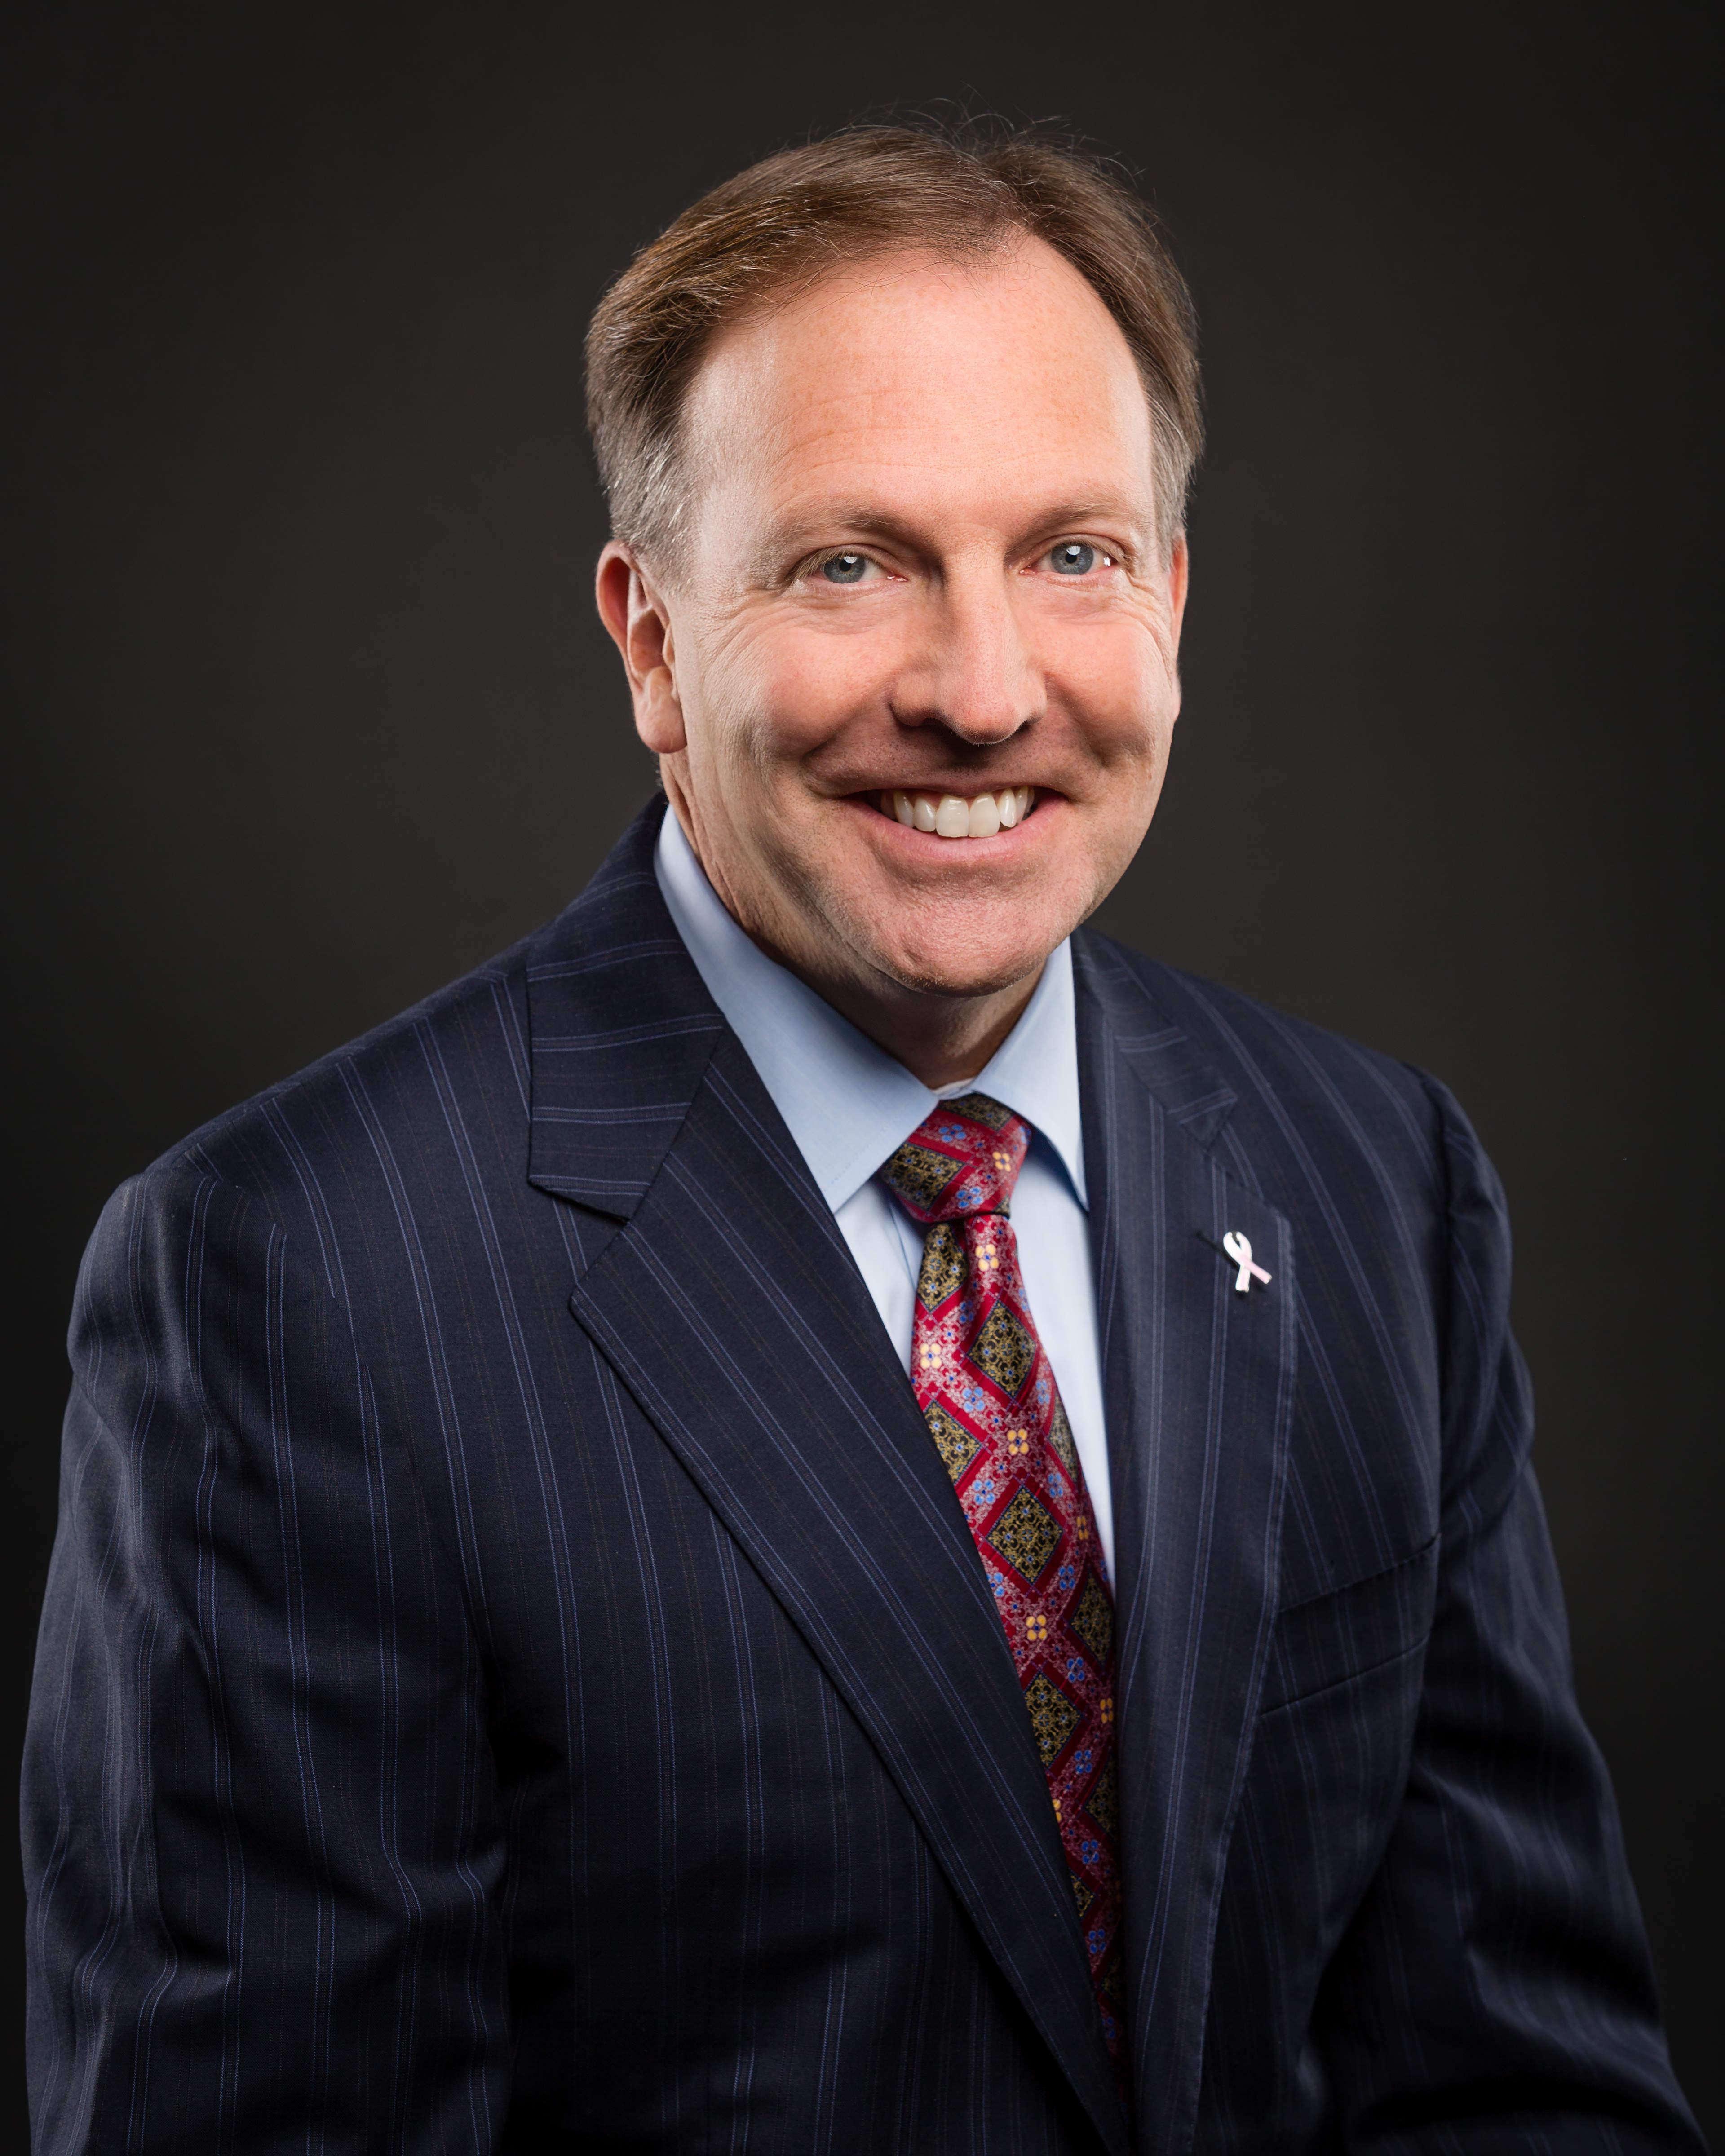 Steve MacMillan, Chairman, President & CEO, Hologic